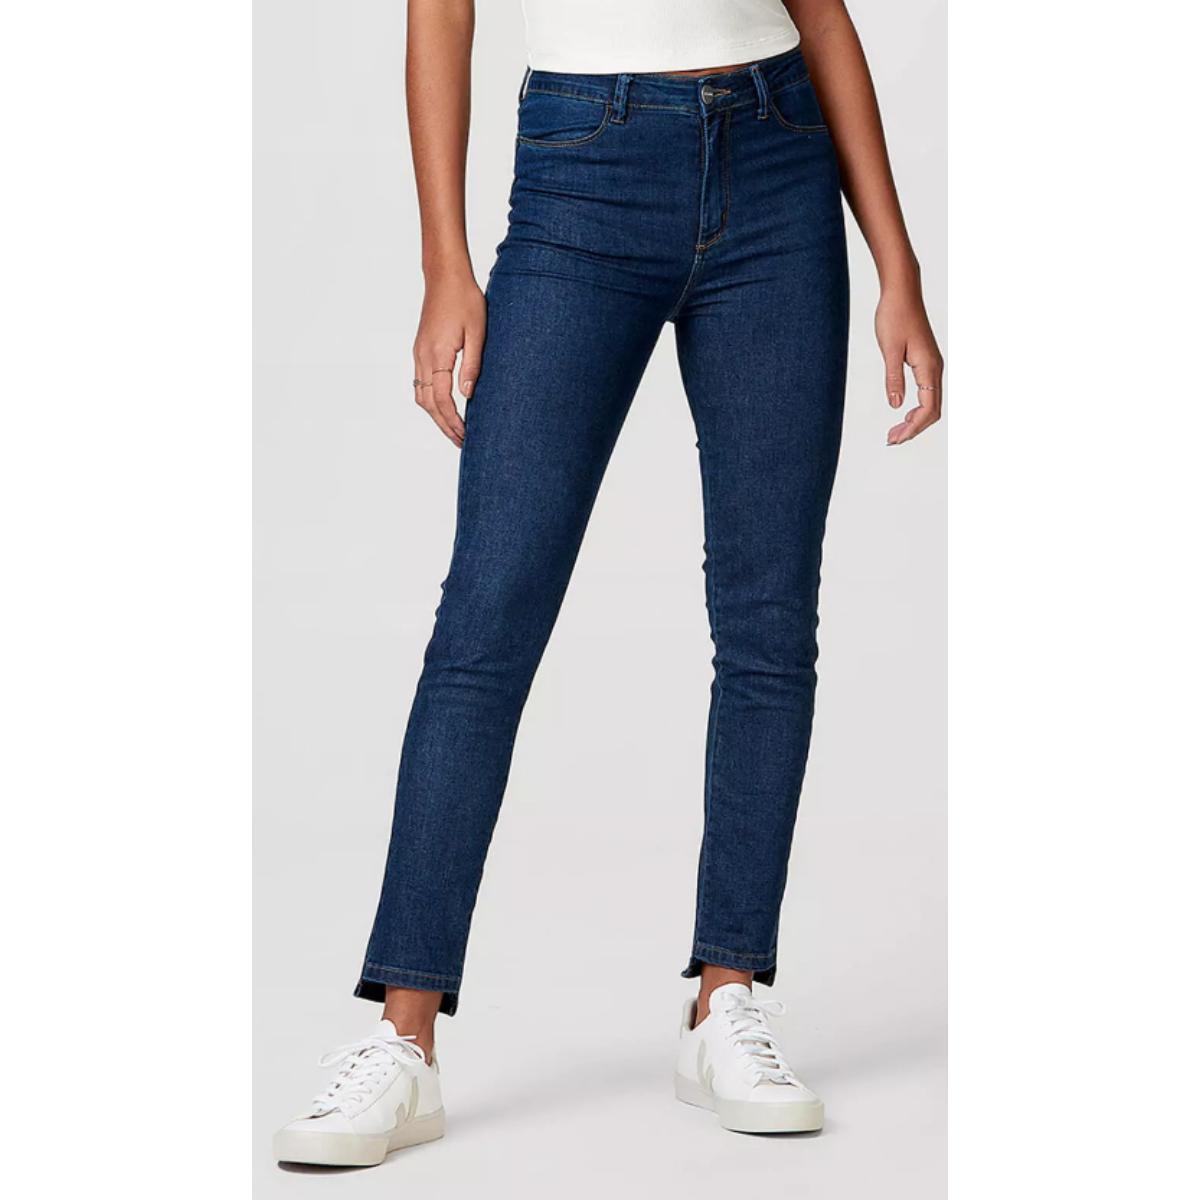 Calça Feminina Hering H954 1dej Jeans